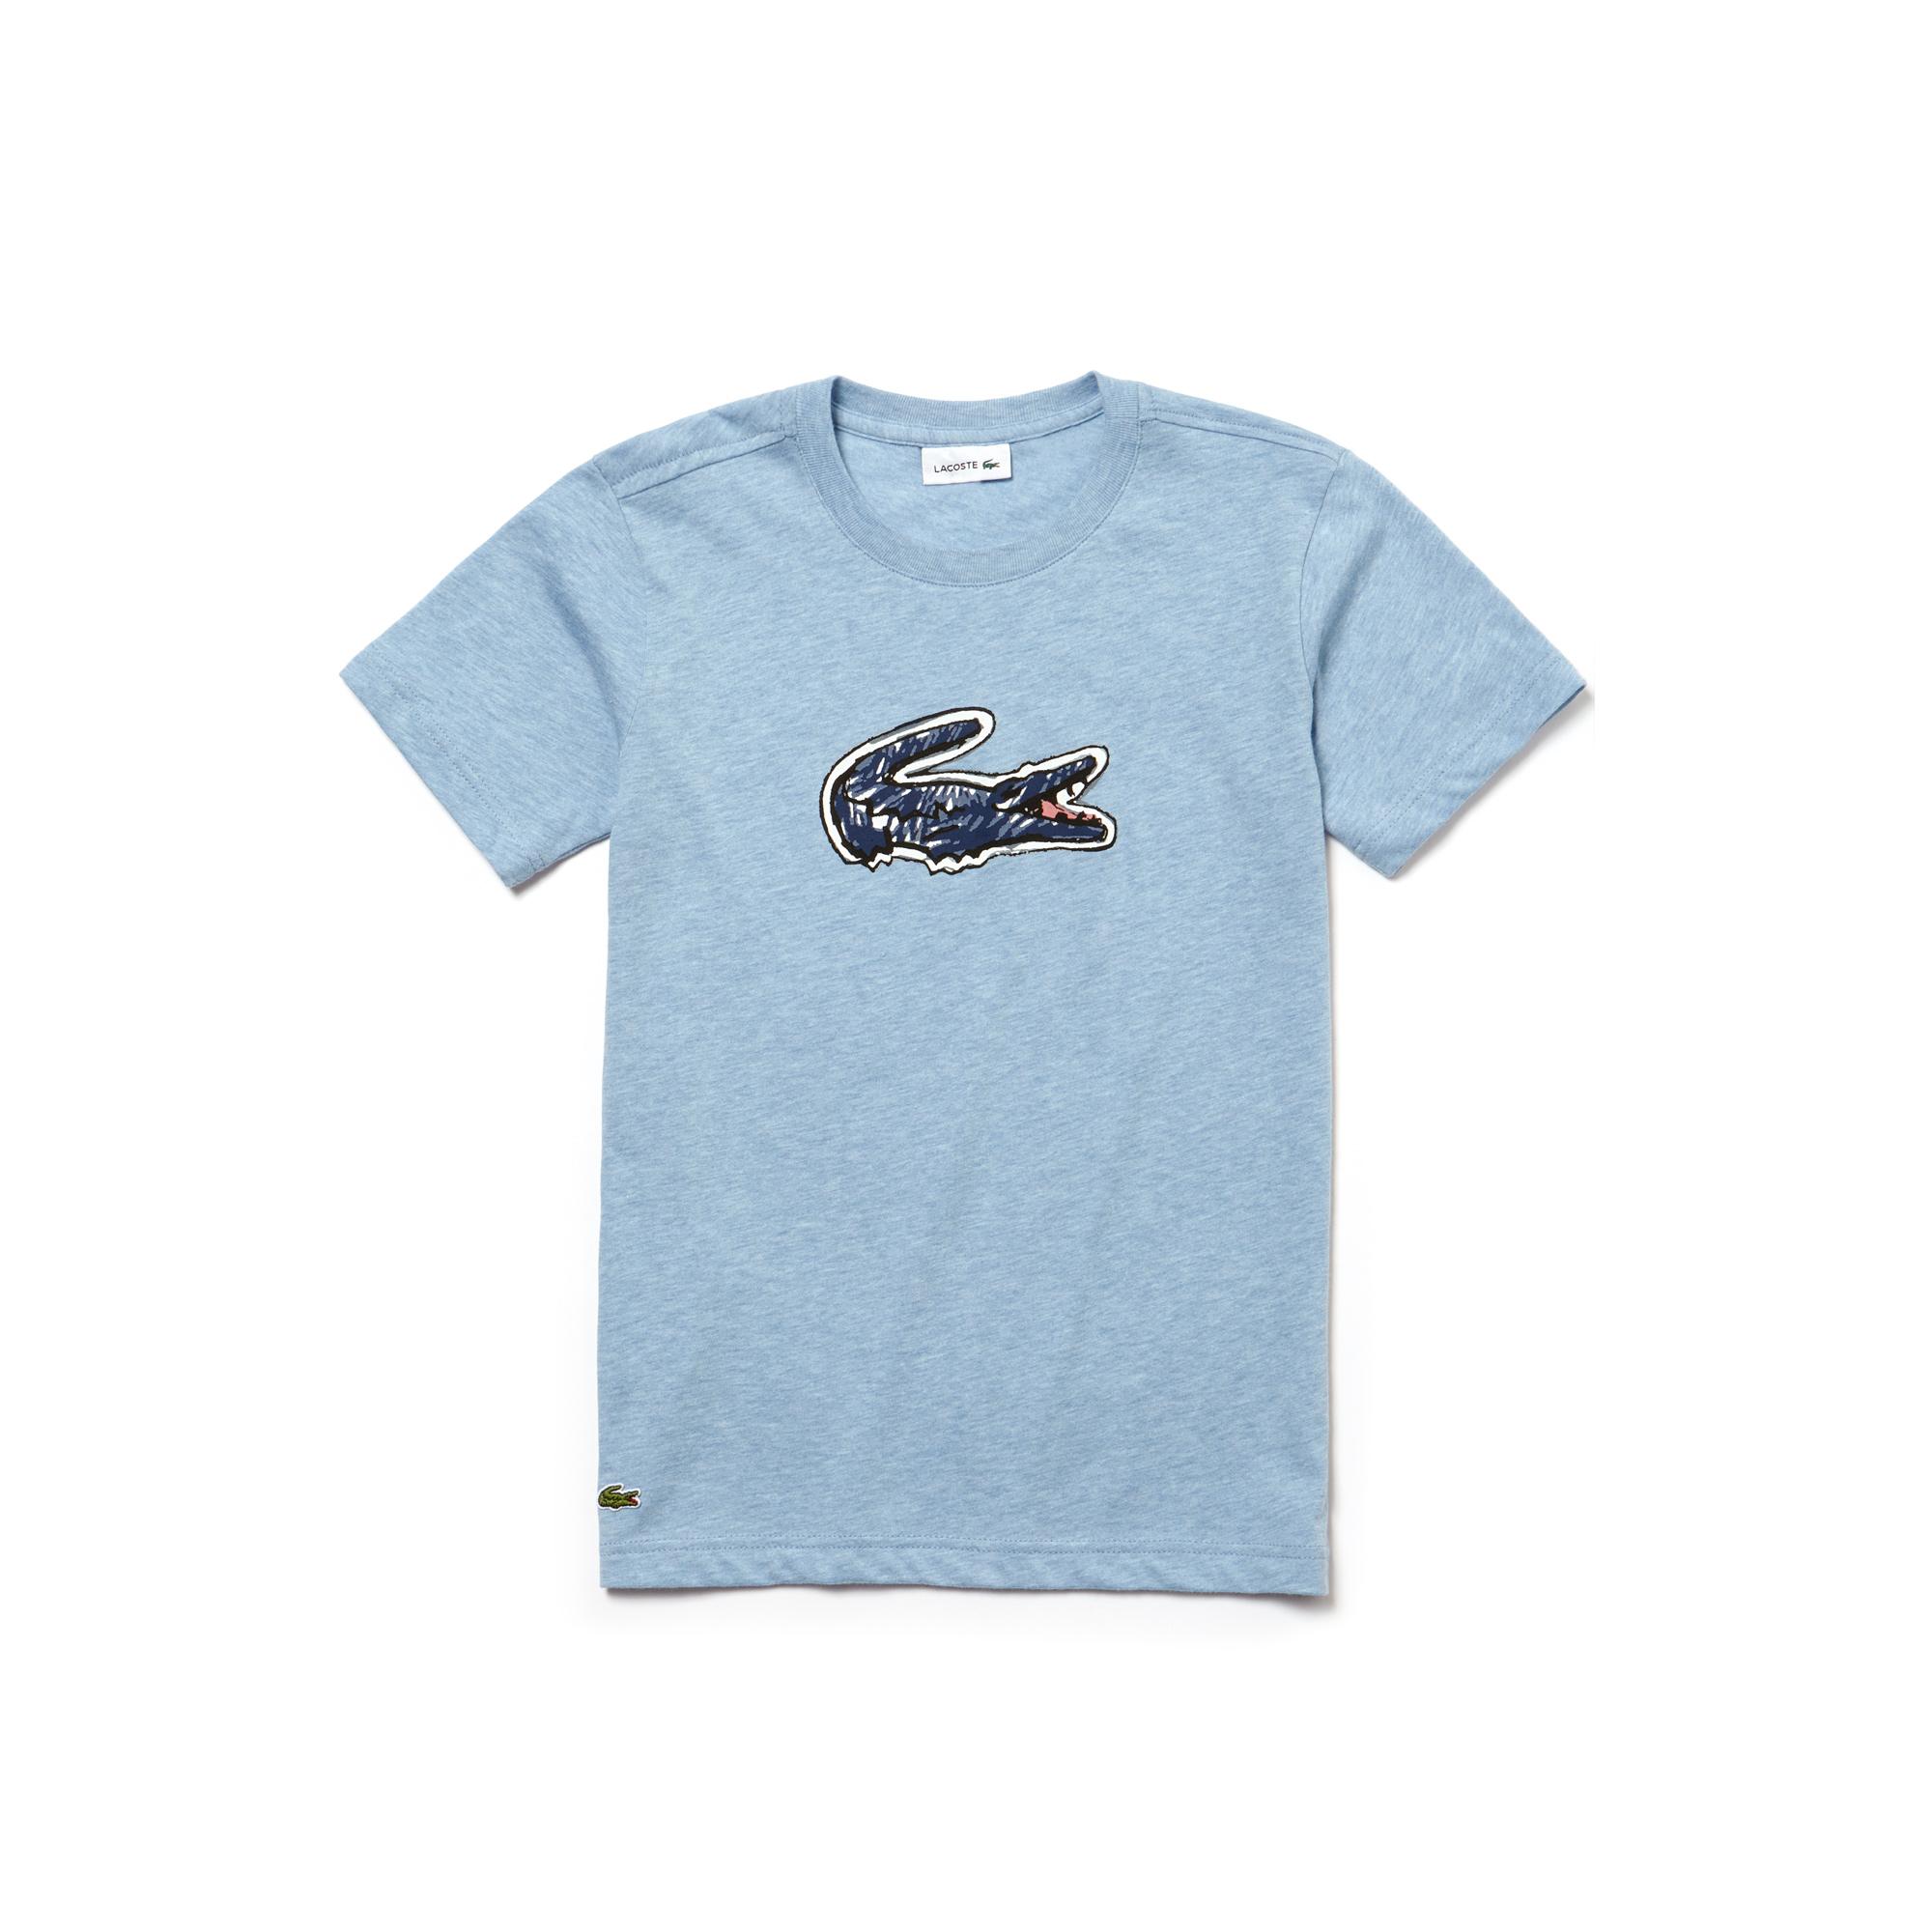 Купить Футболка Lacoste, голубой, TJ3860